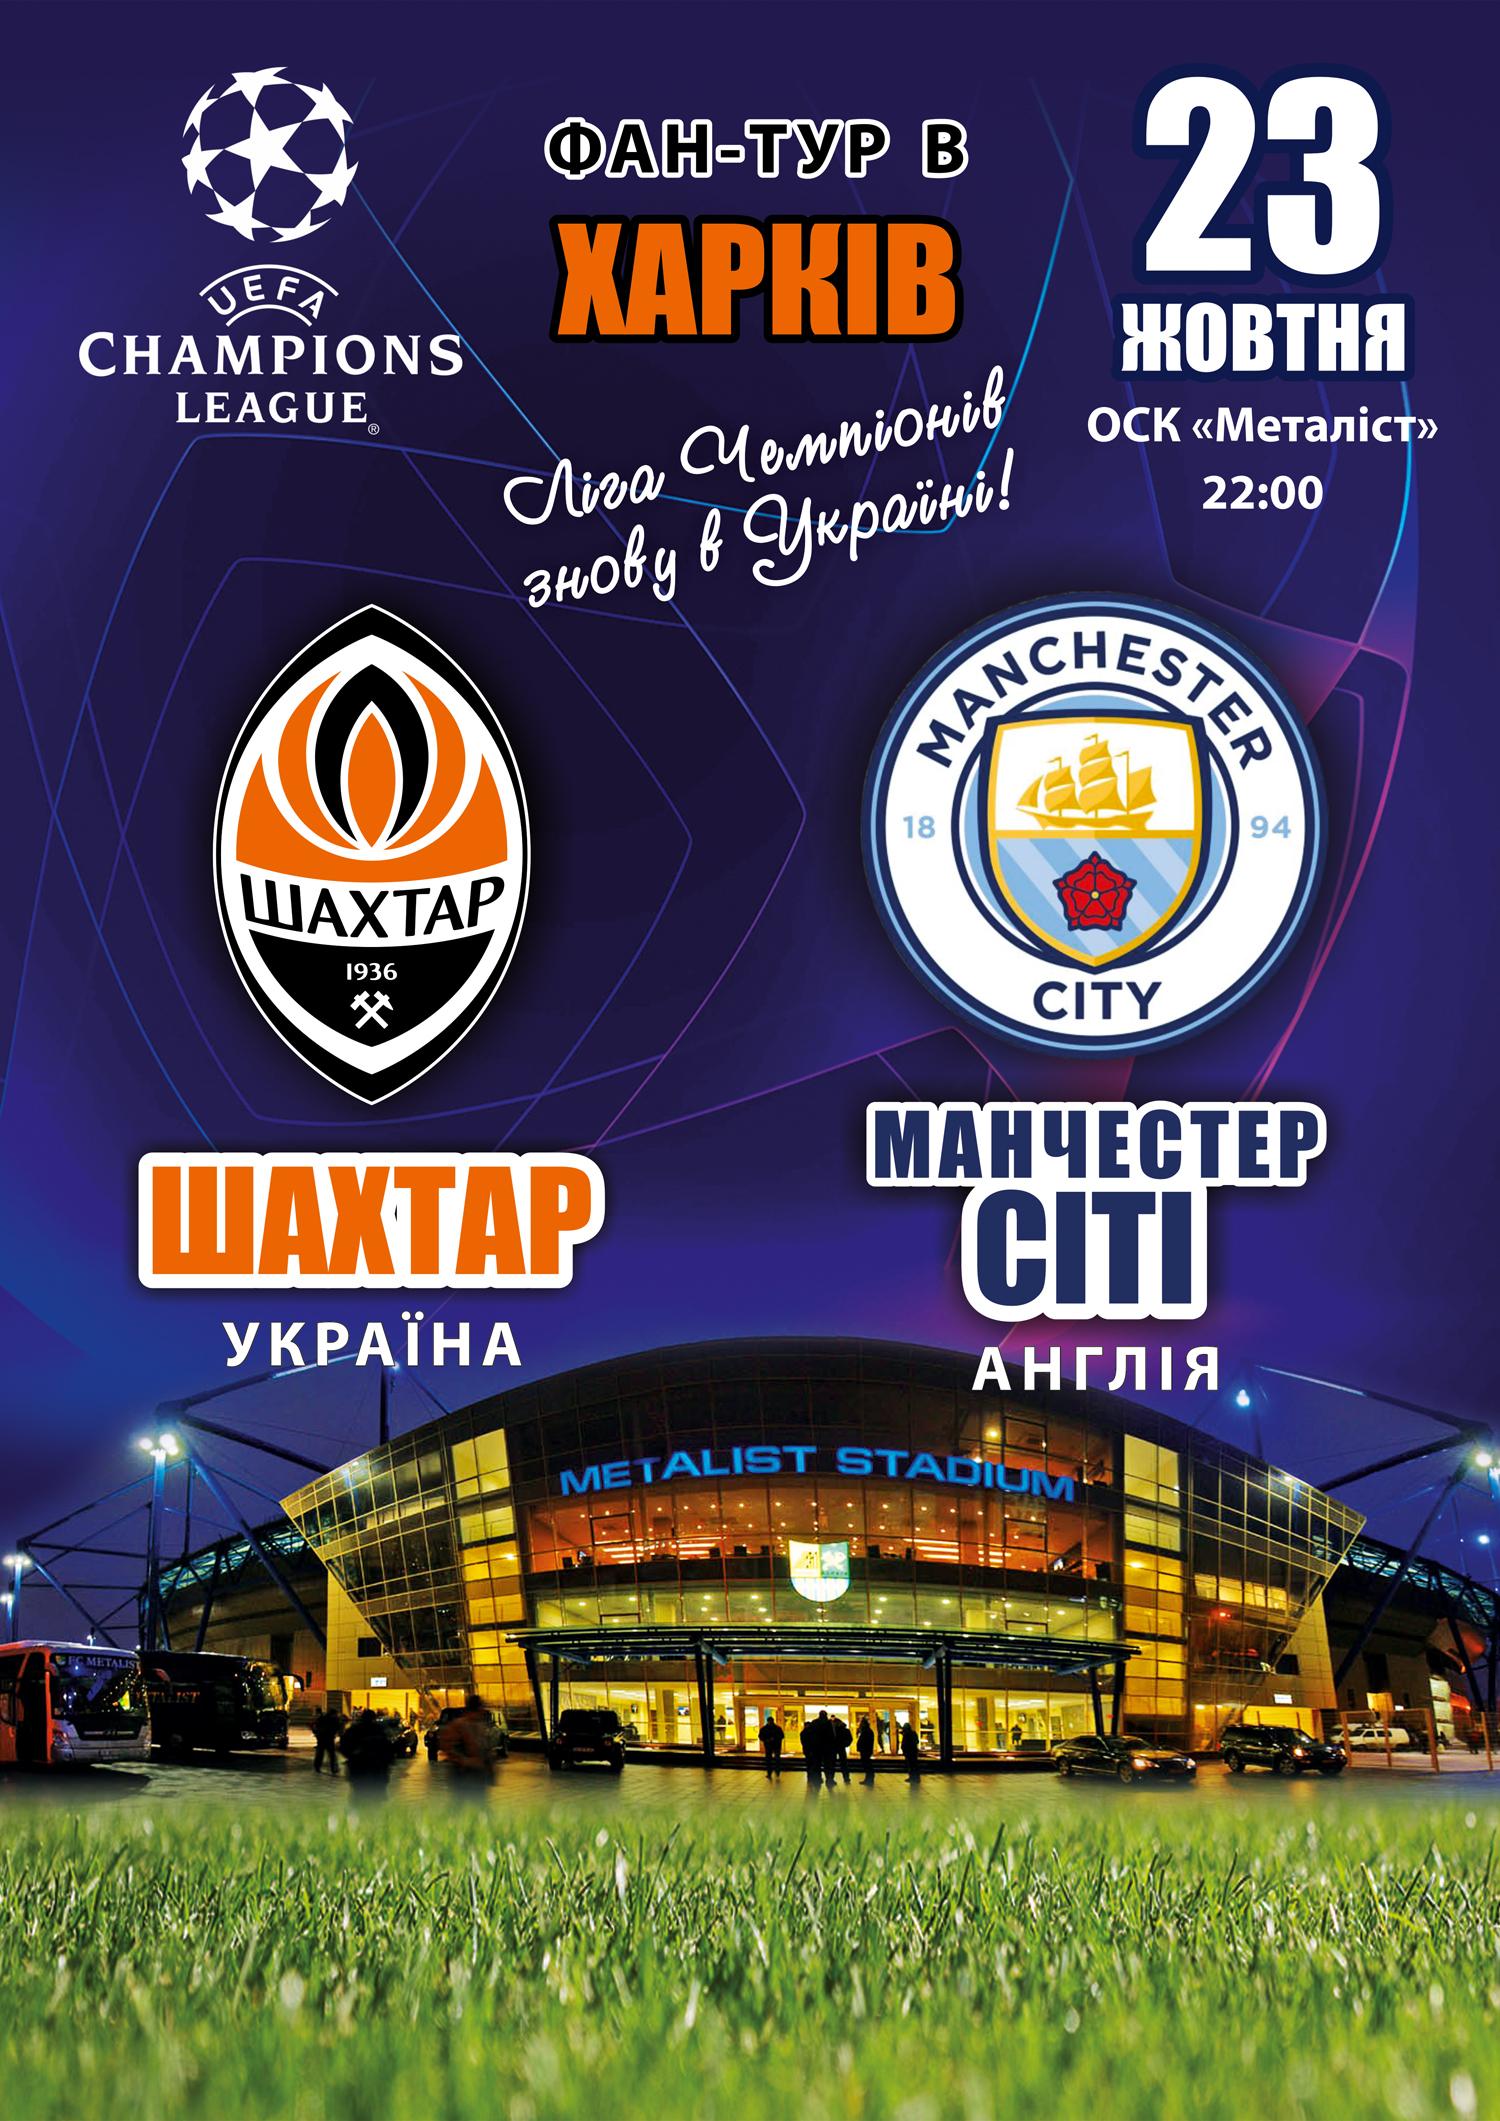 Фан-тур на матч Лиги Чемпионов Шахтер–Манчестер Сити (Львов)